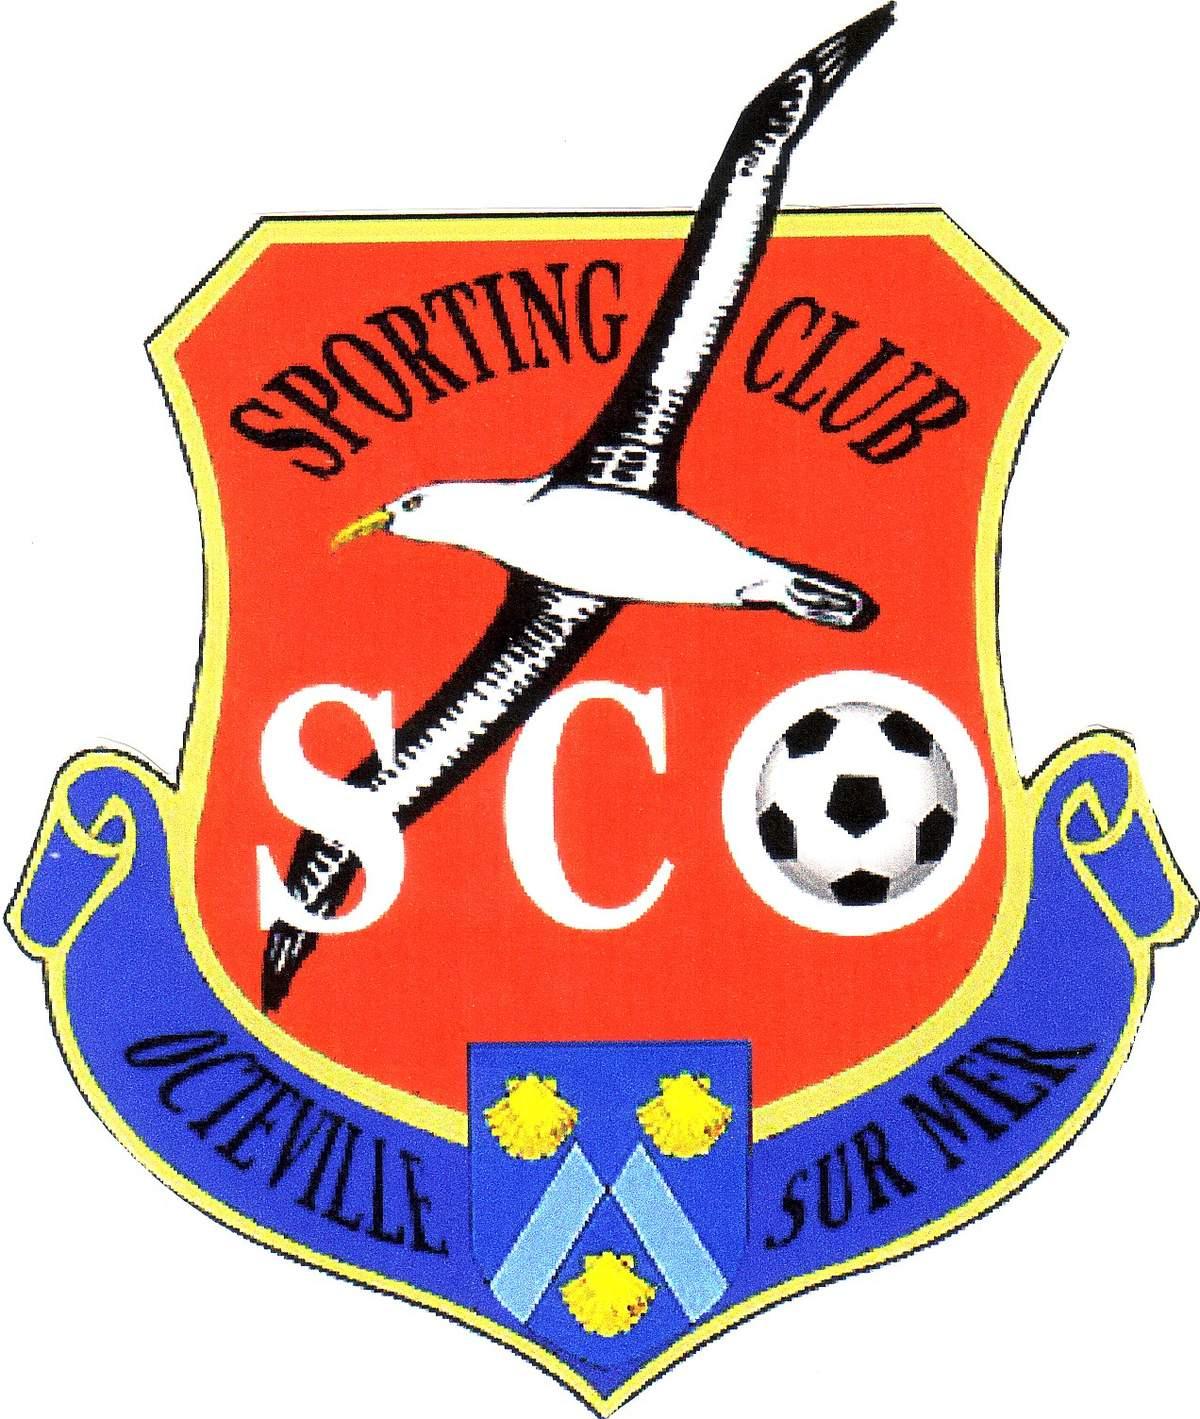 SPORTING CLUB OCTEVILLAIS CLUB LABELLISE FFF : Site